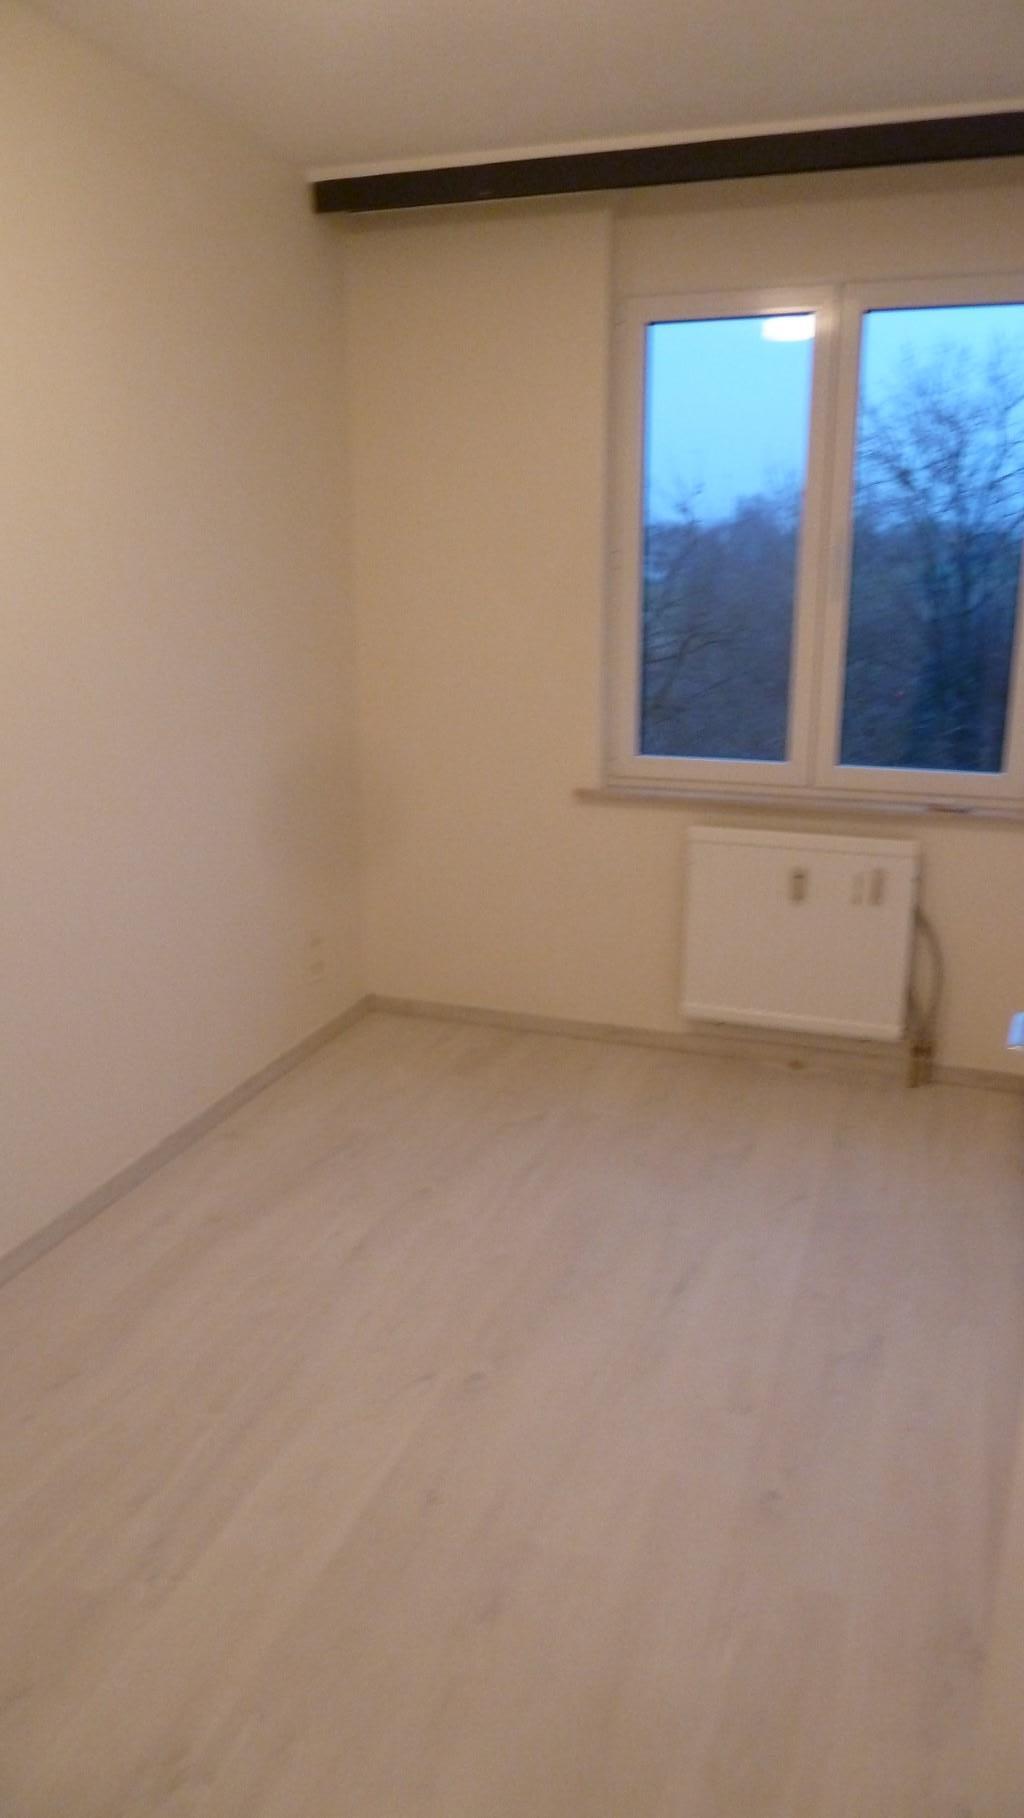 Appartement - Zaventem Sint-Stevens-Woluwe - #3970084-10